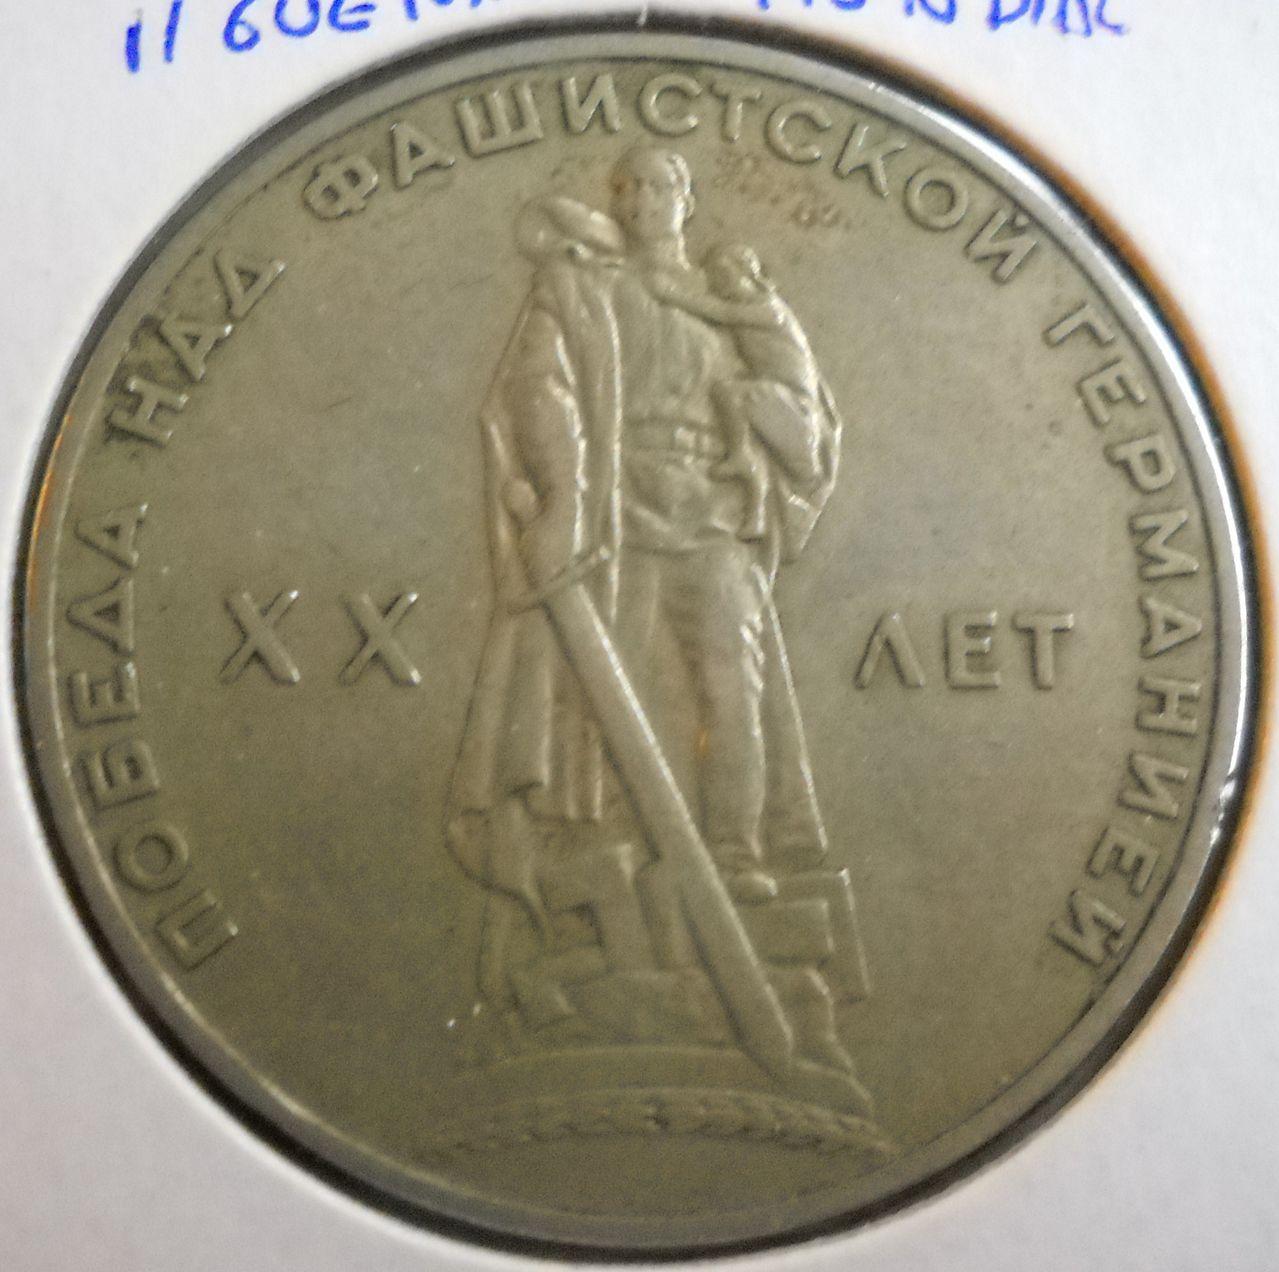 Un rublo 1965 conmemorativo DSCN0033